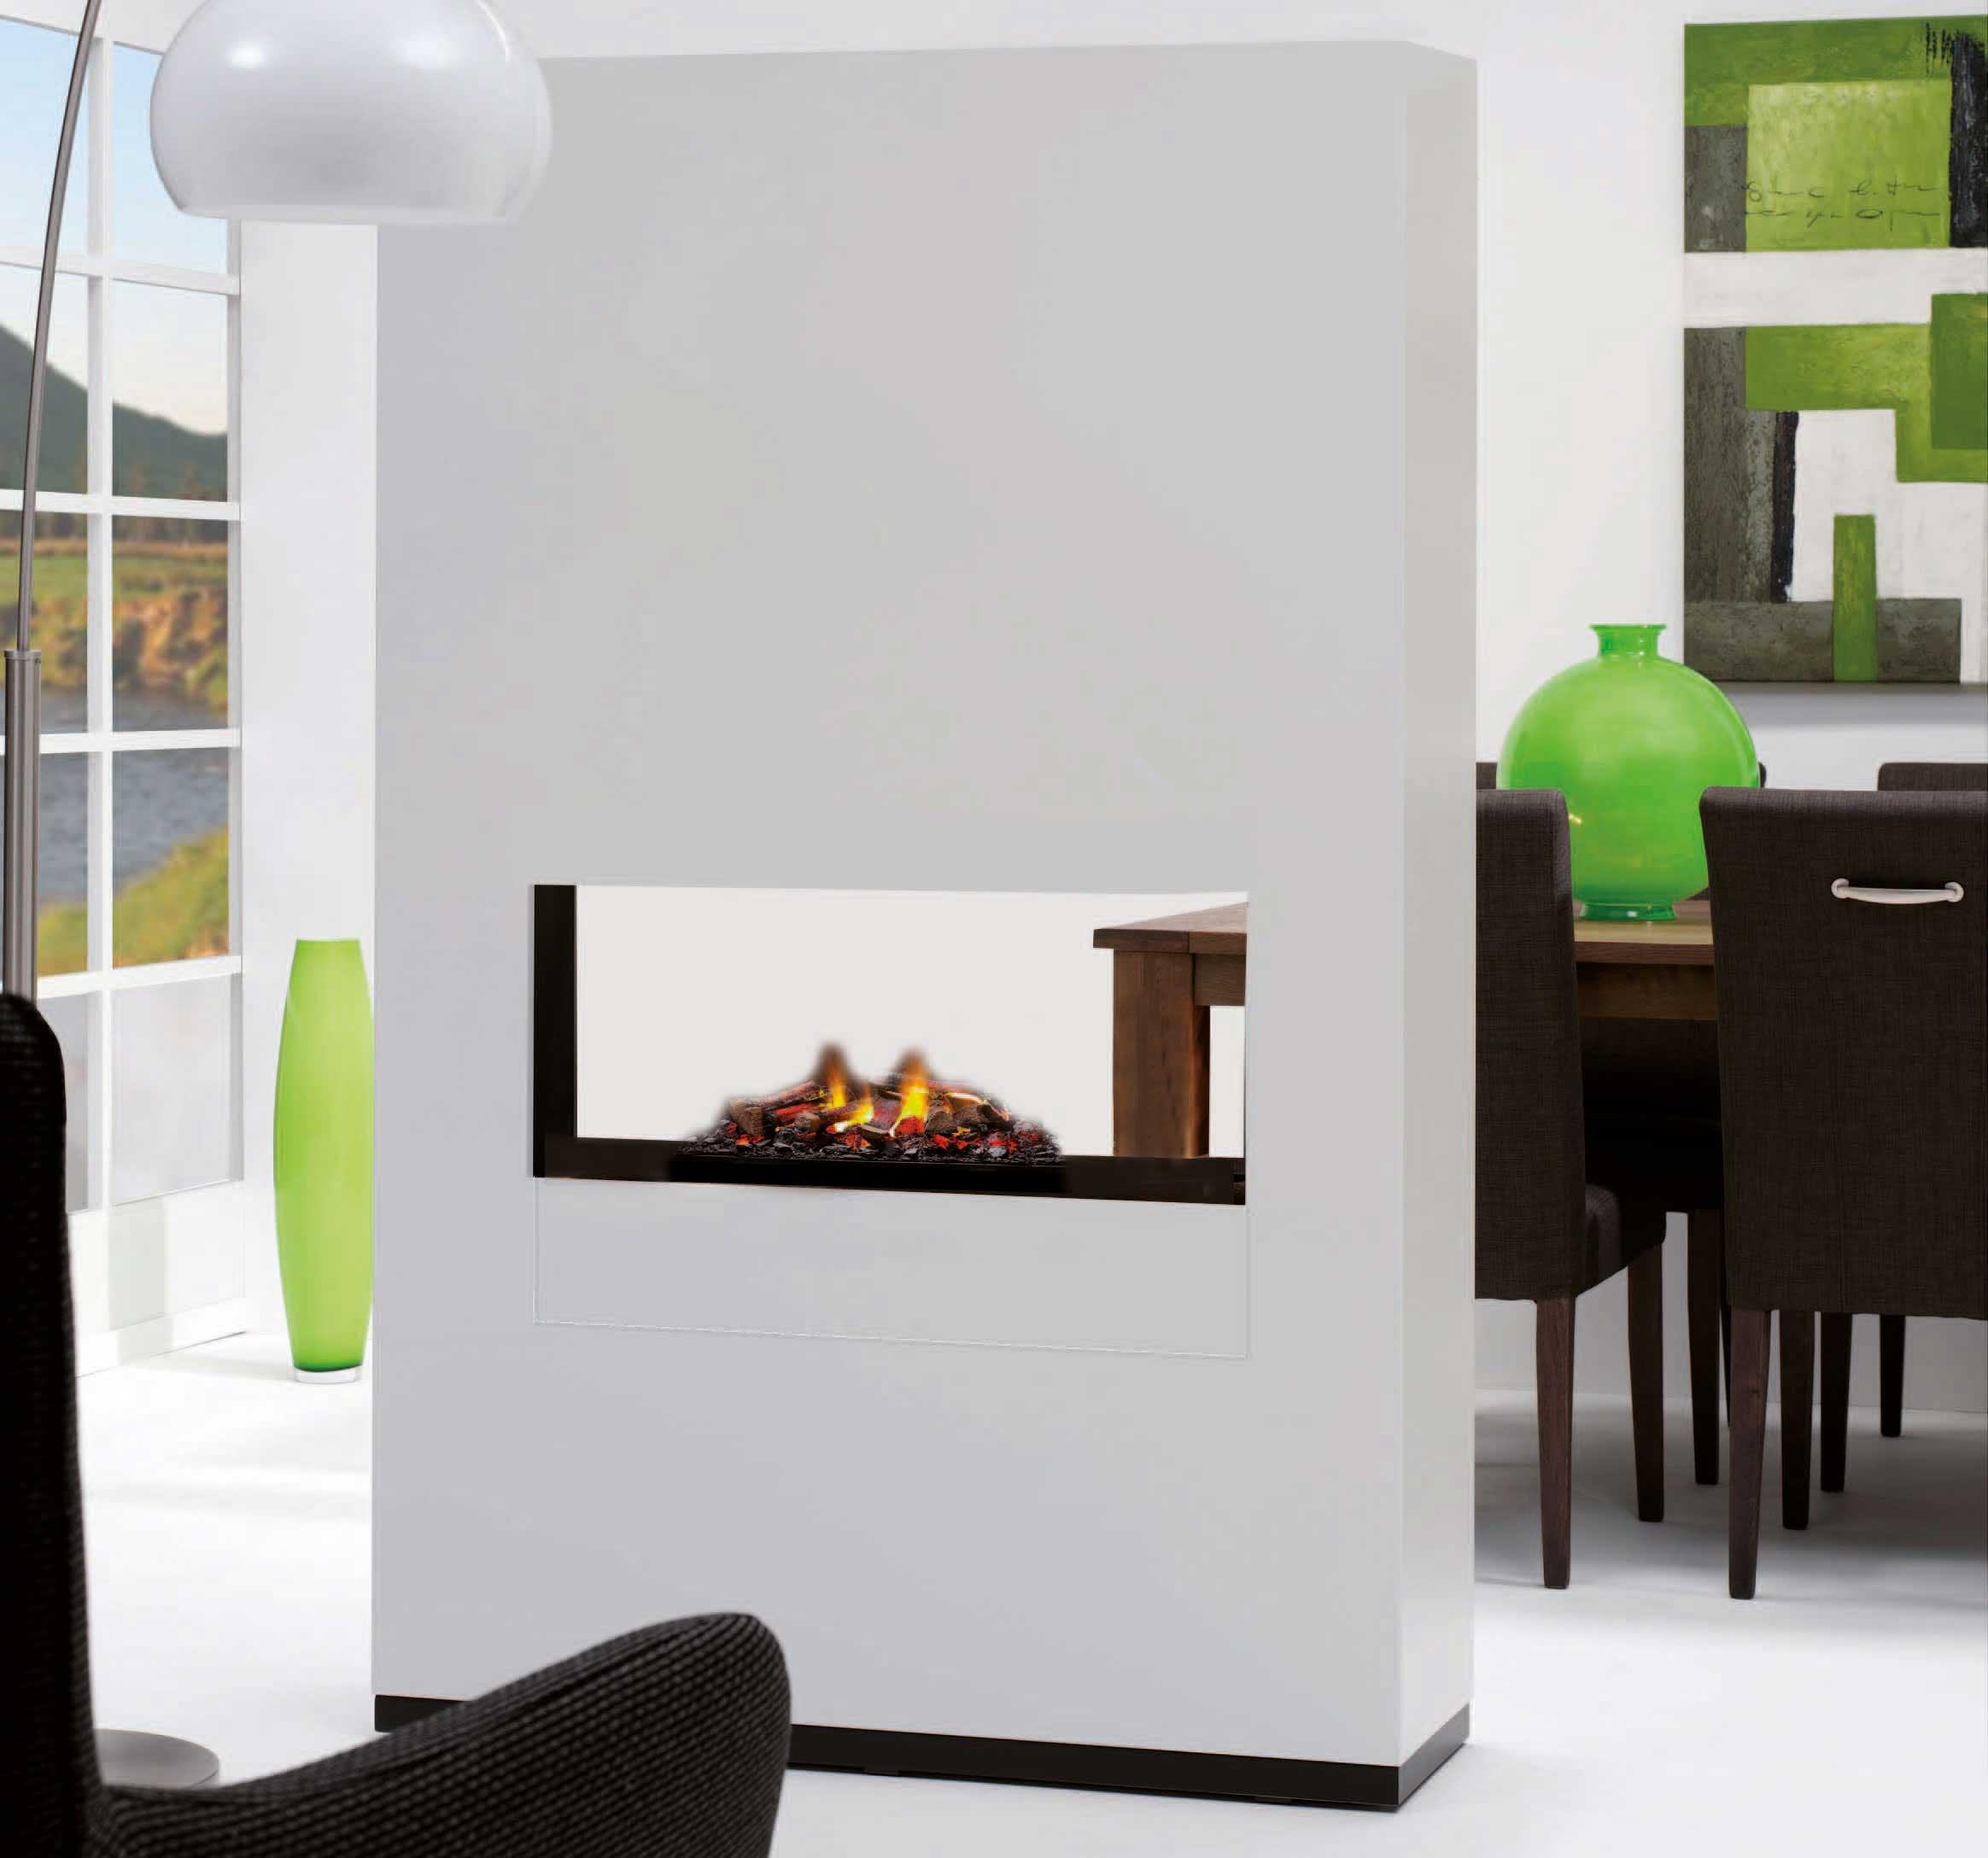 Ruby Fires Bioethanol Kamin Ambiance online kaufen | borono